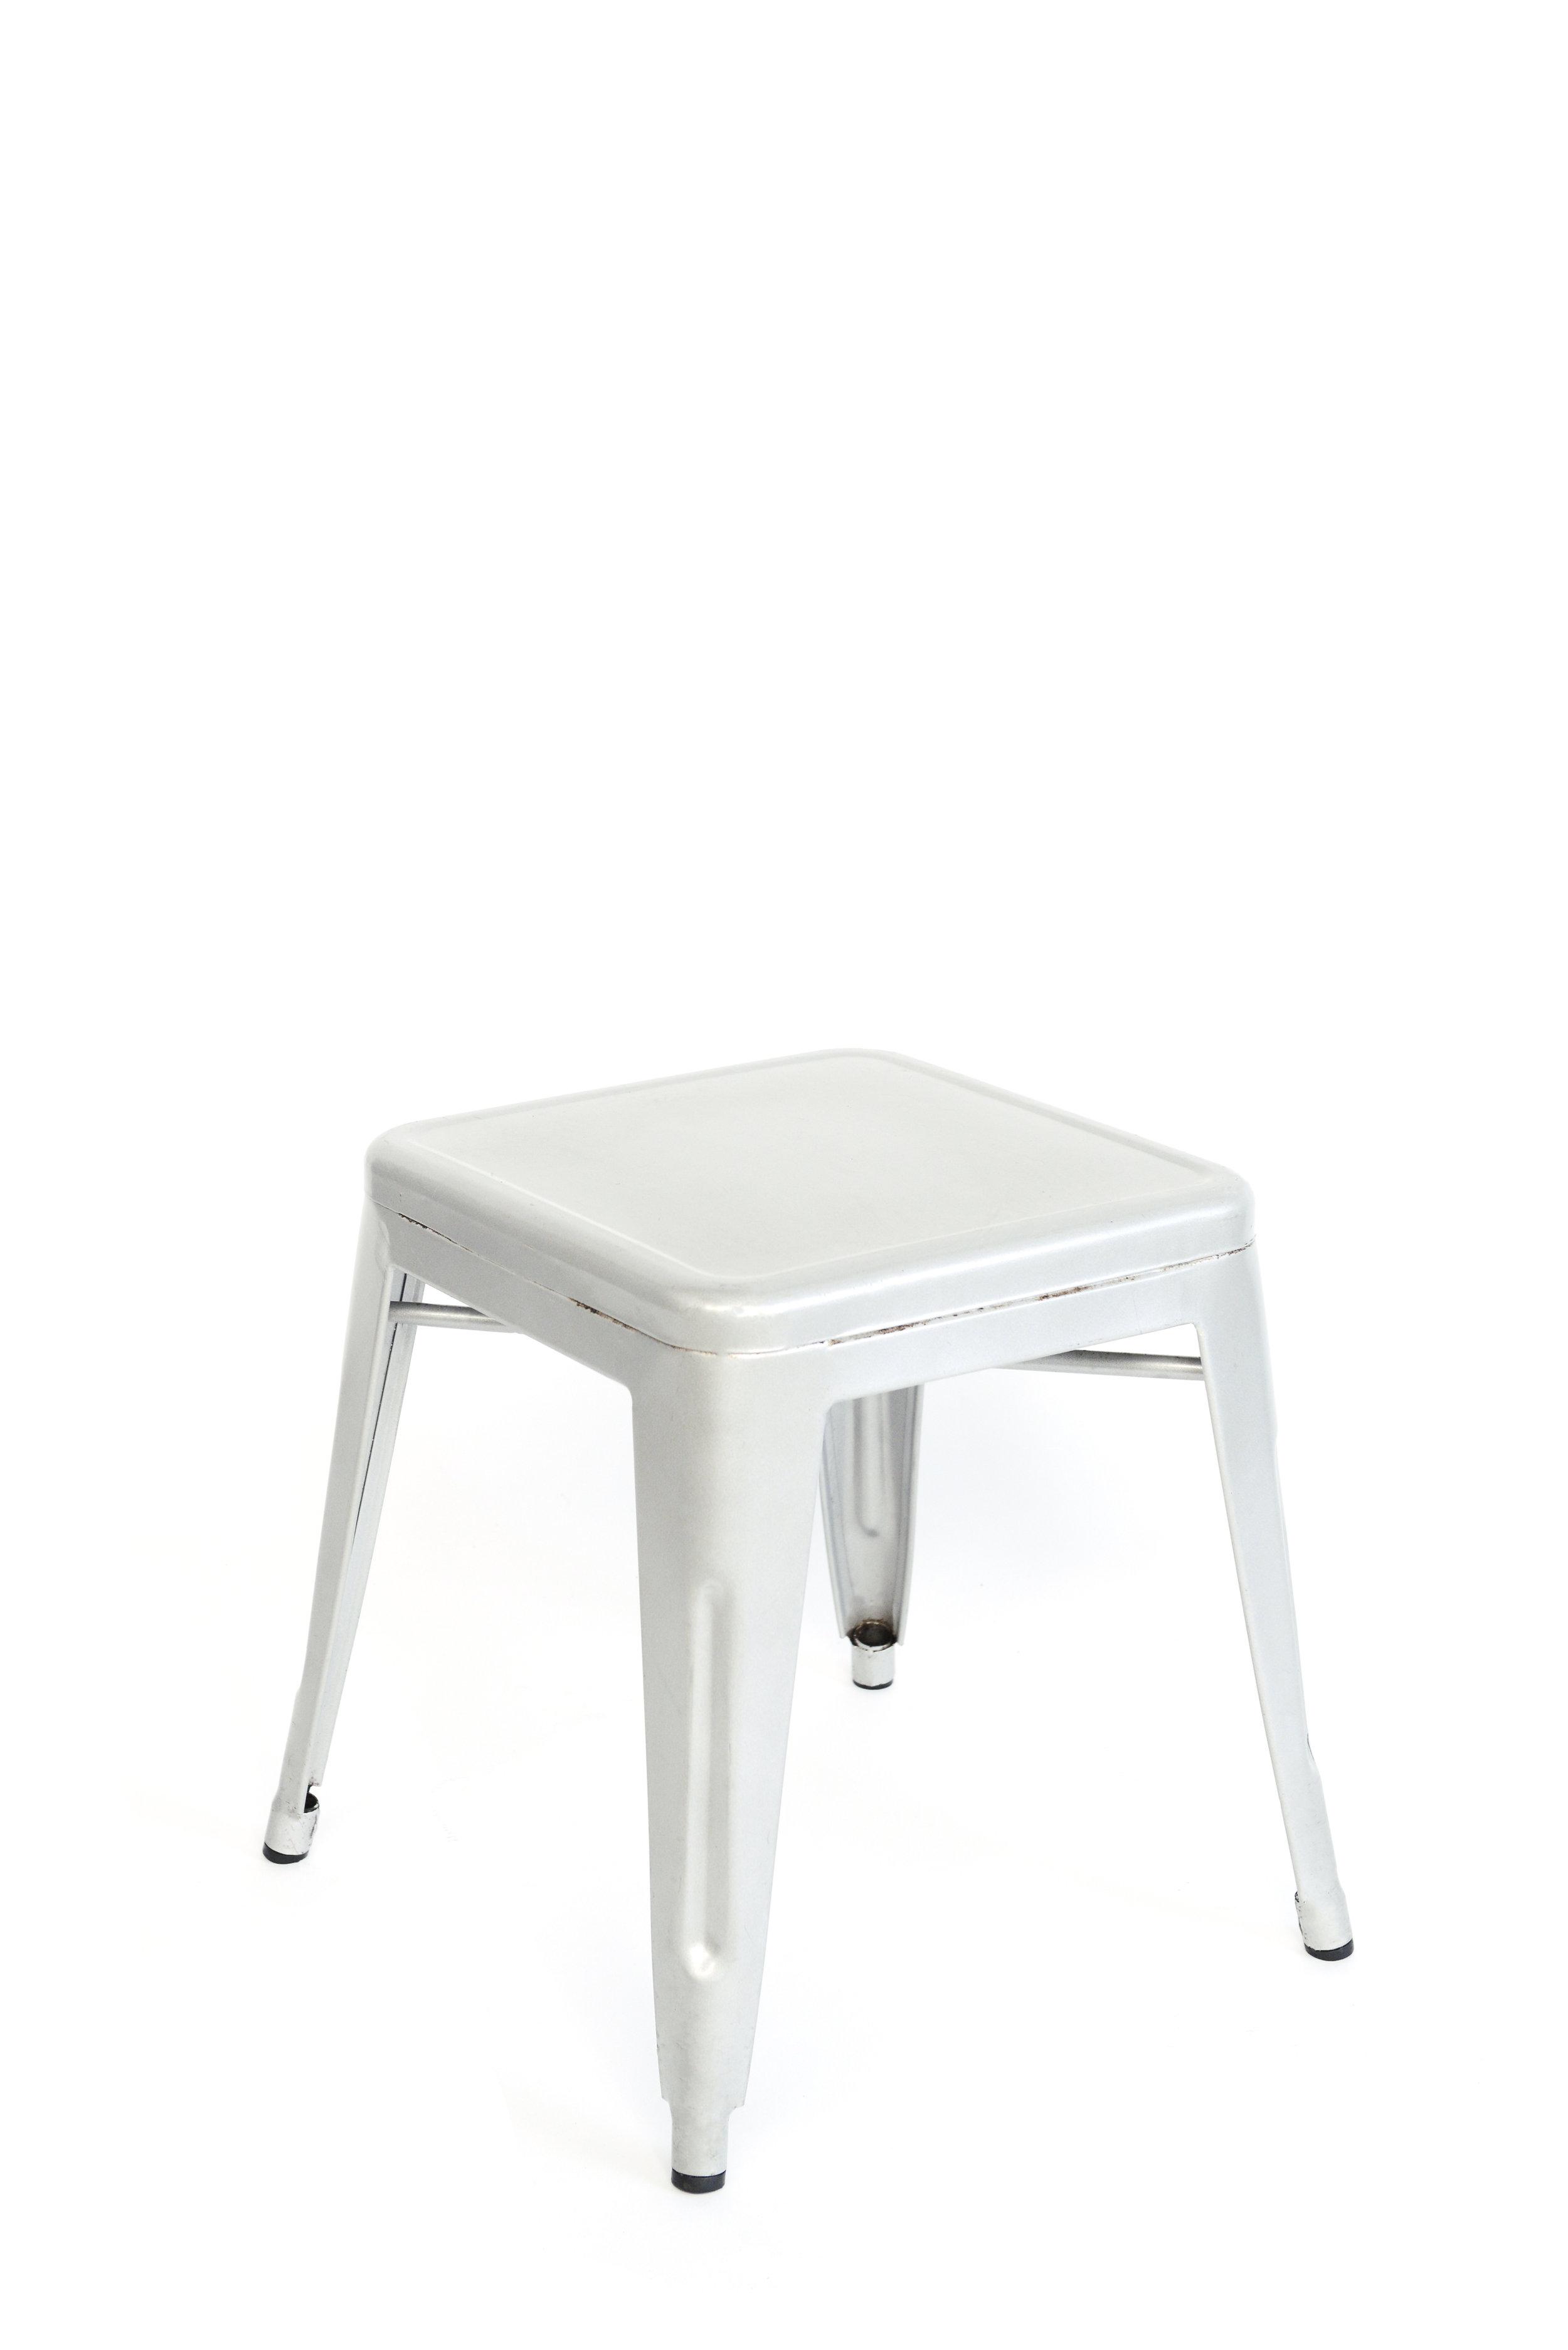 Silver stools qty. 2